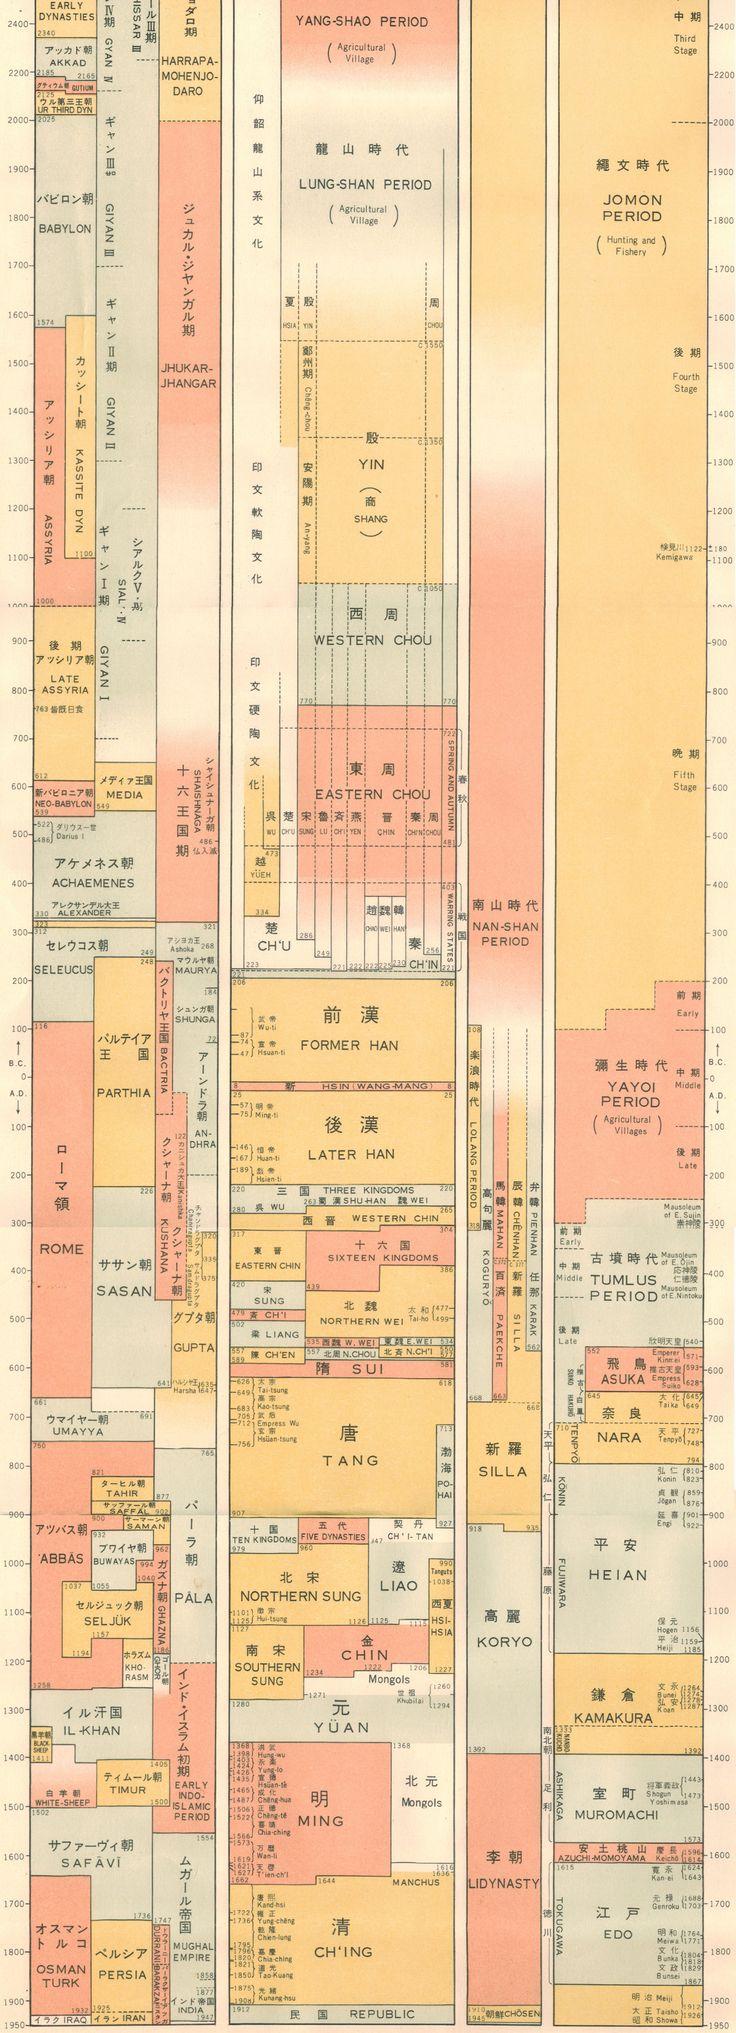 Chronological Chart of Asian History, 1960, Ling Imports, La Jolla, CA